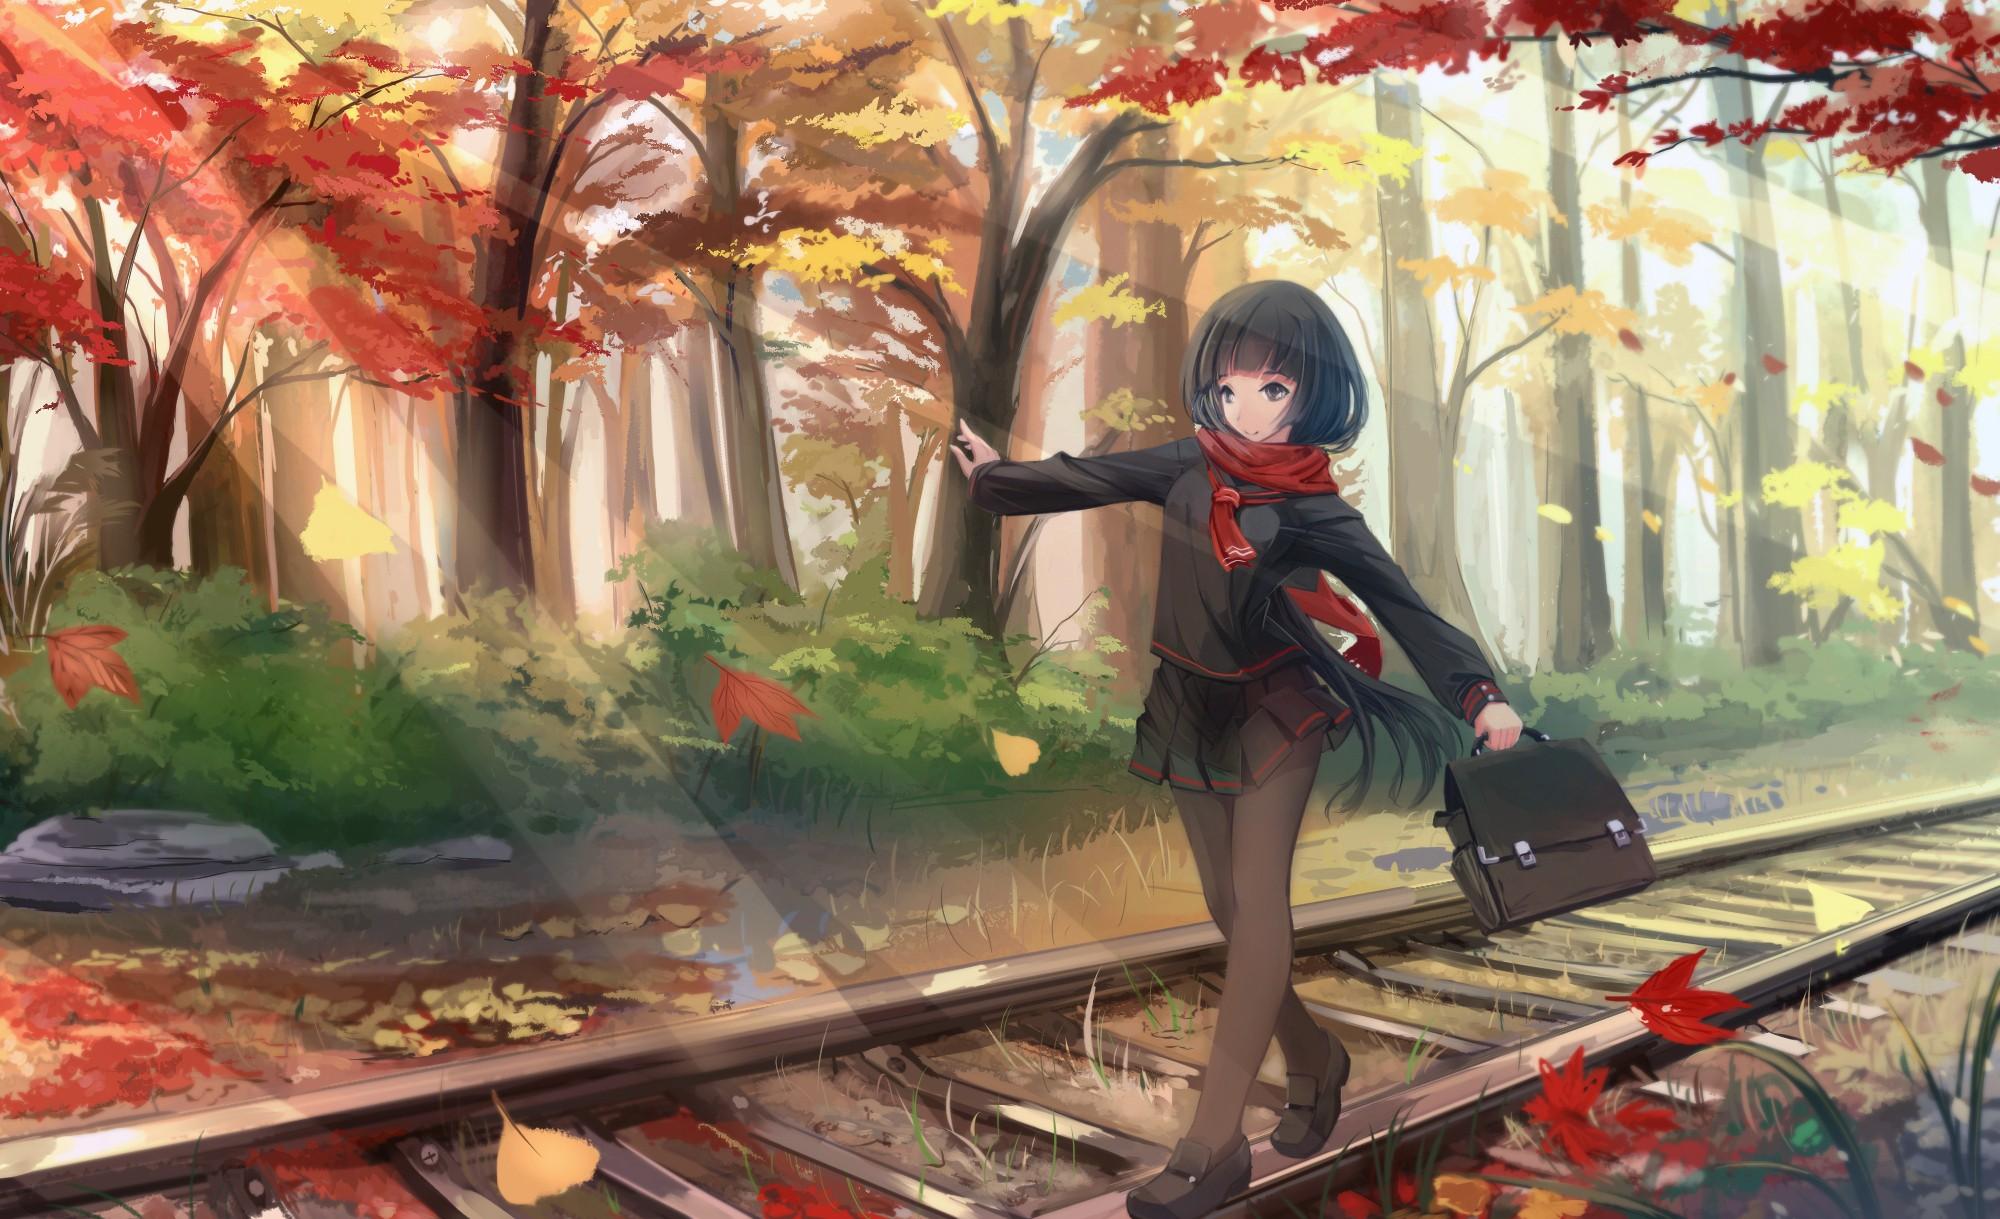 Anime 2000x1219 anime girls original characters fall black hair scarf leaves long hair pantyhose school uniform trees